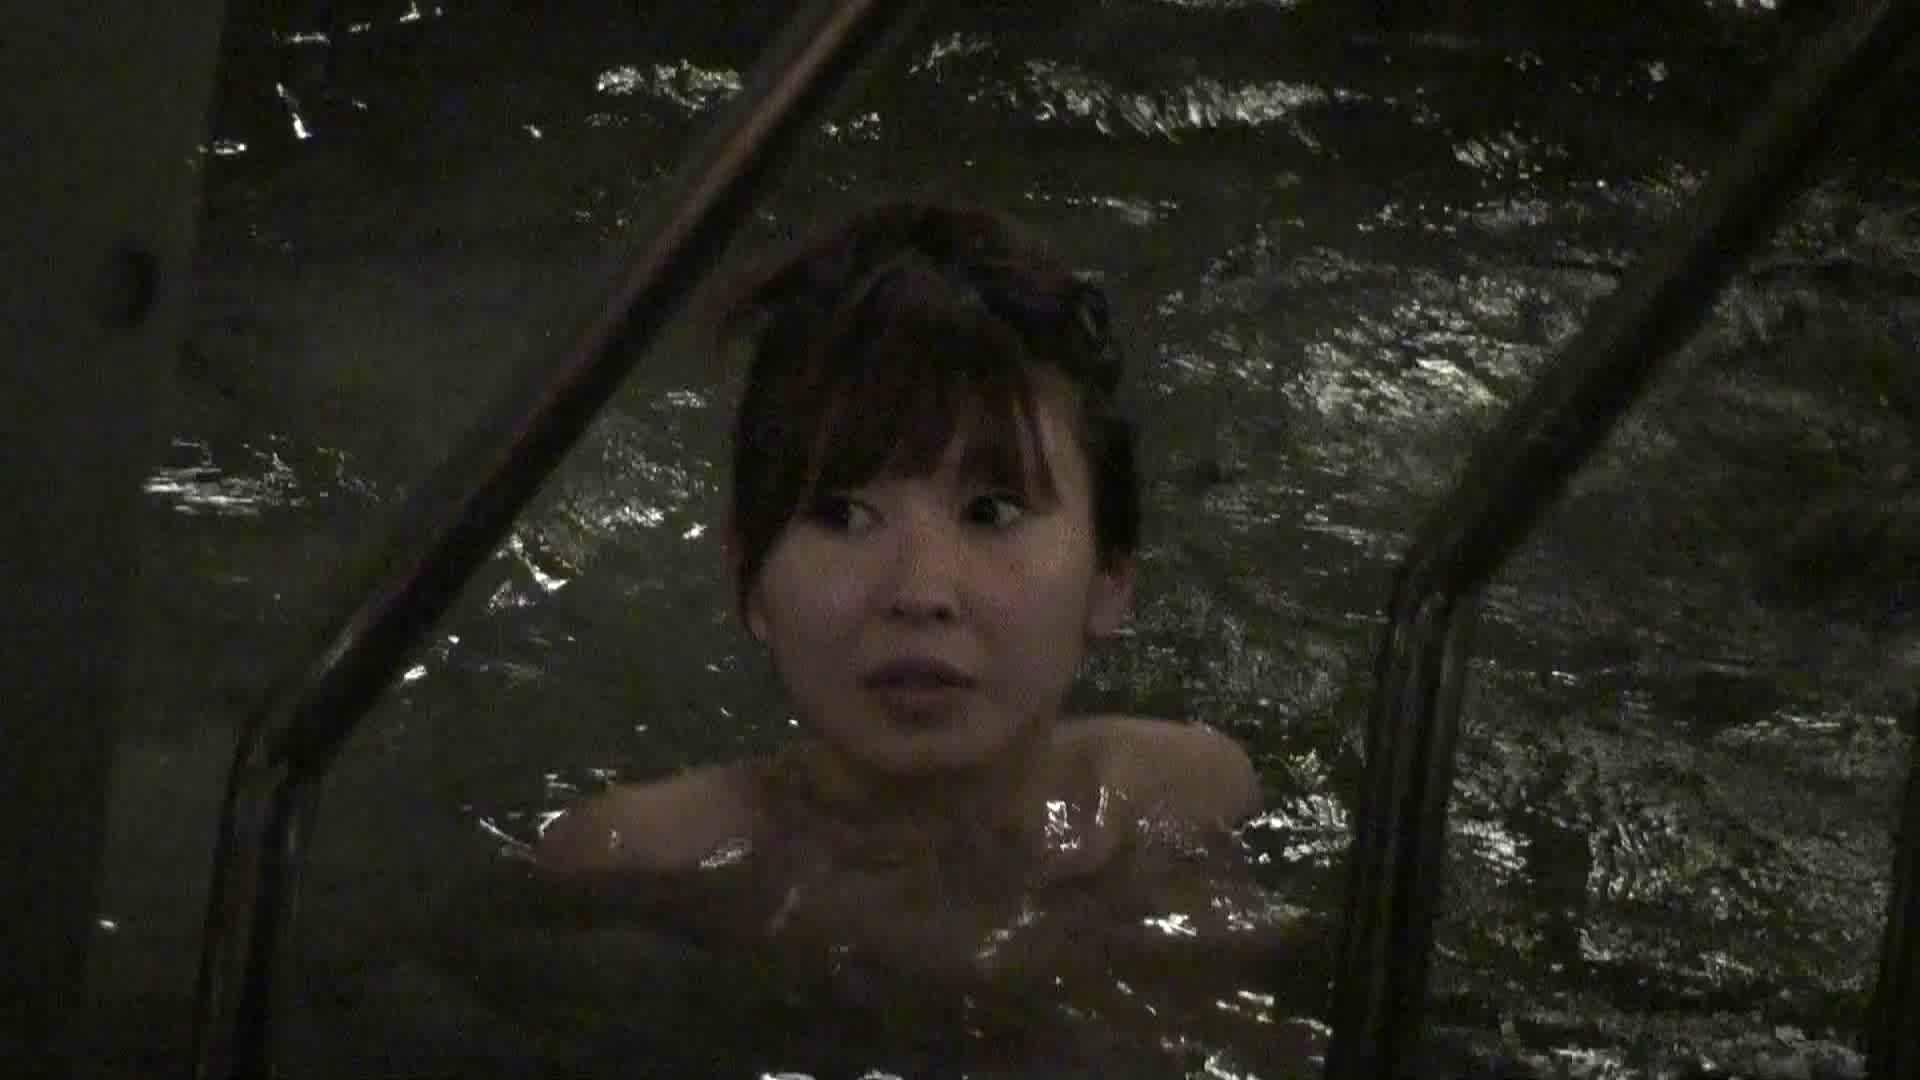 Aquaな露天風呂Vol.410 盗撮   OLエロ画像  29PICs 22